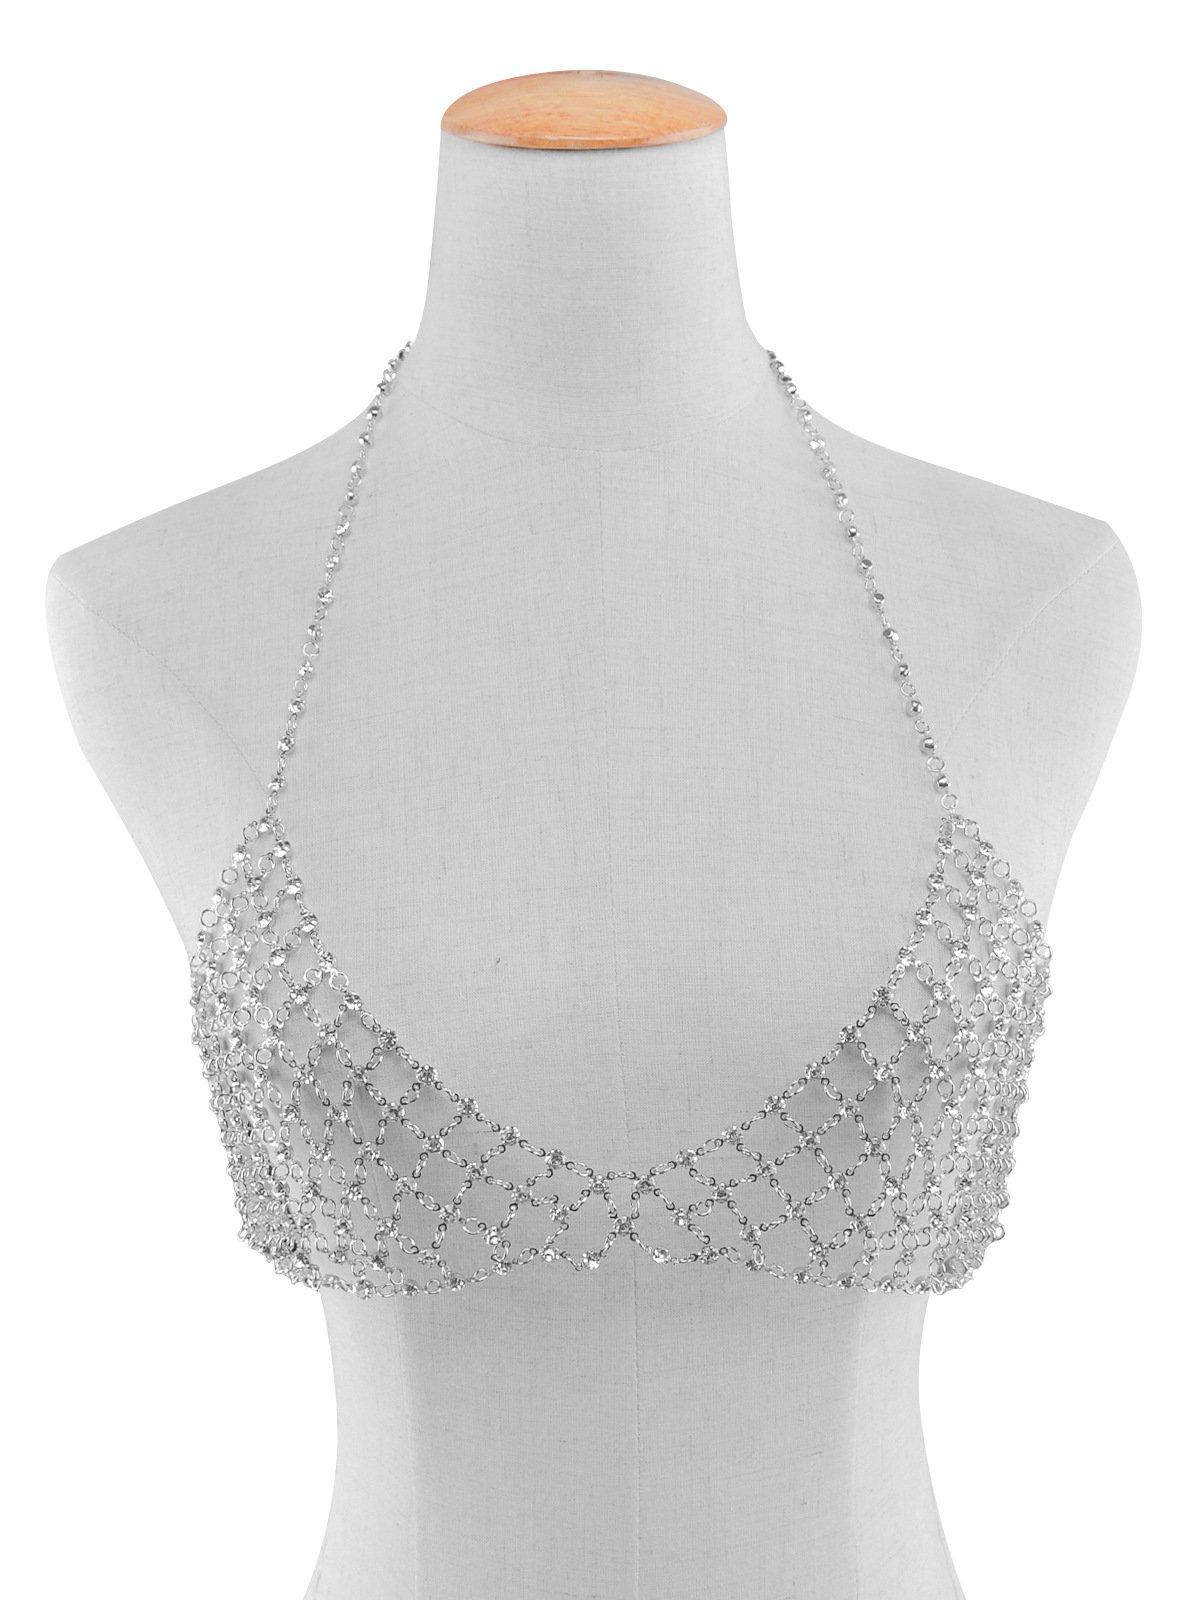 ANGELANGELA Luxury Sexy Gold Silver Tone Clear Rhinestone Diamond Charm Bikini Bra Filigree Netted Chest Belly Tassel Chains Crossover Harness Necklace Body Jewelry (Silver)